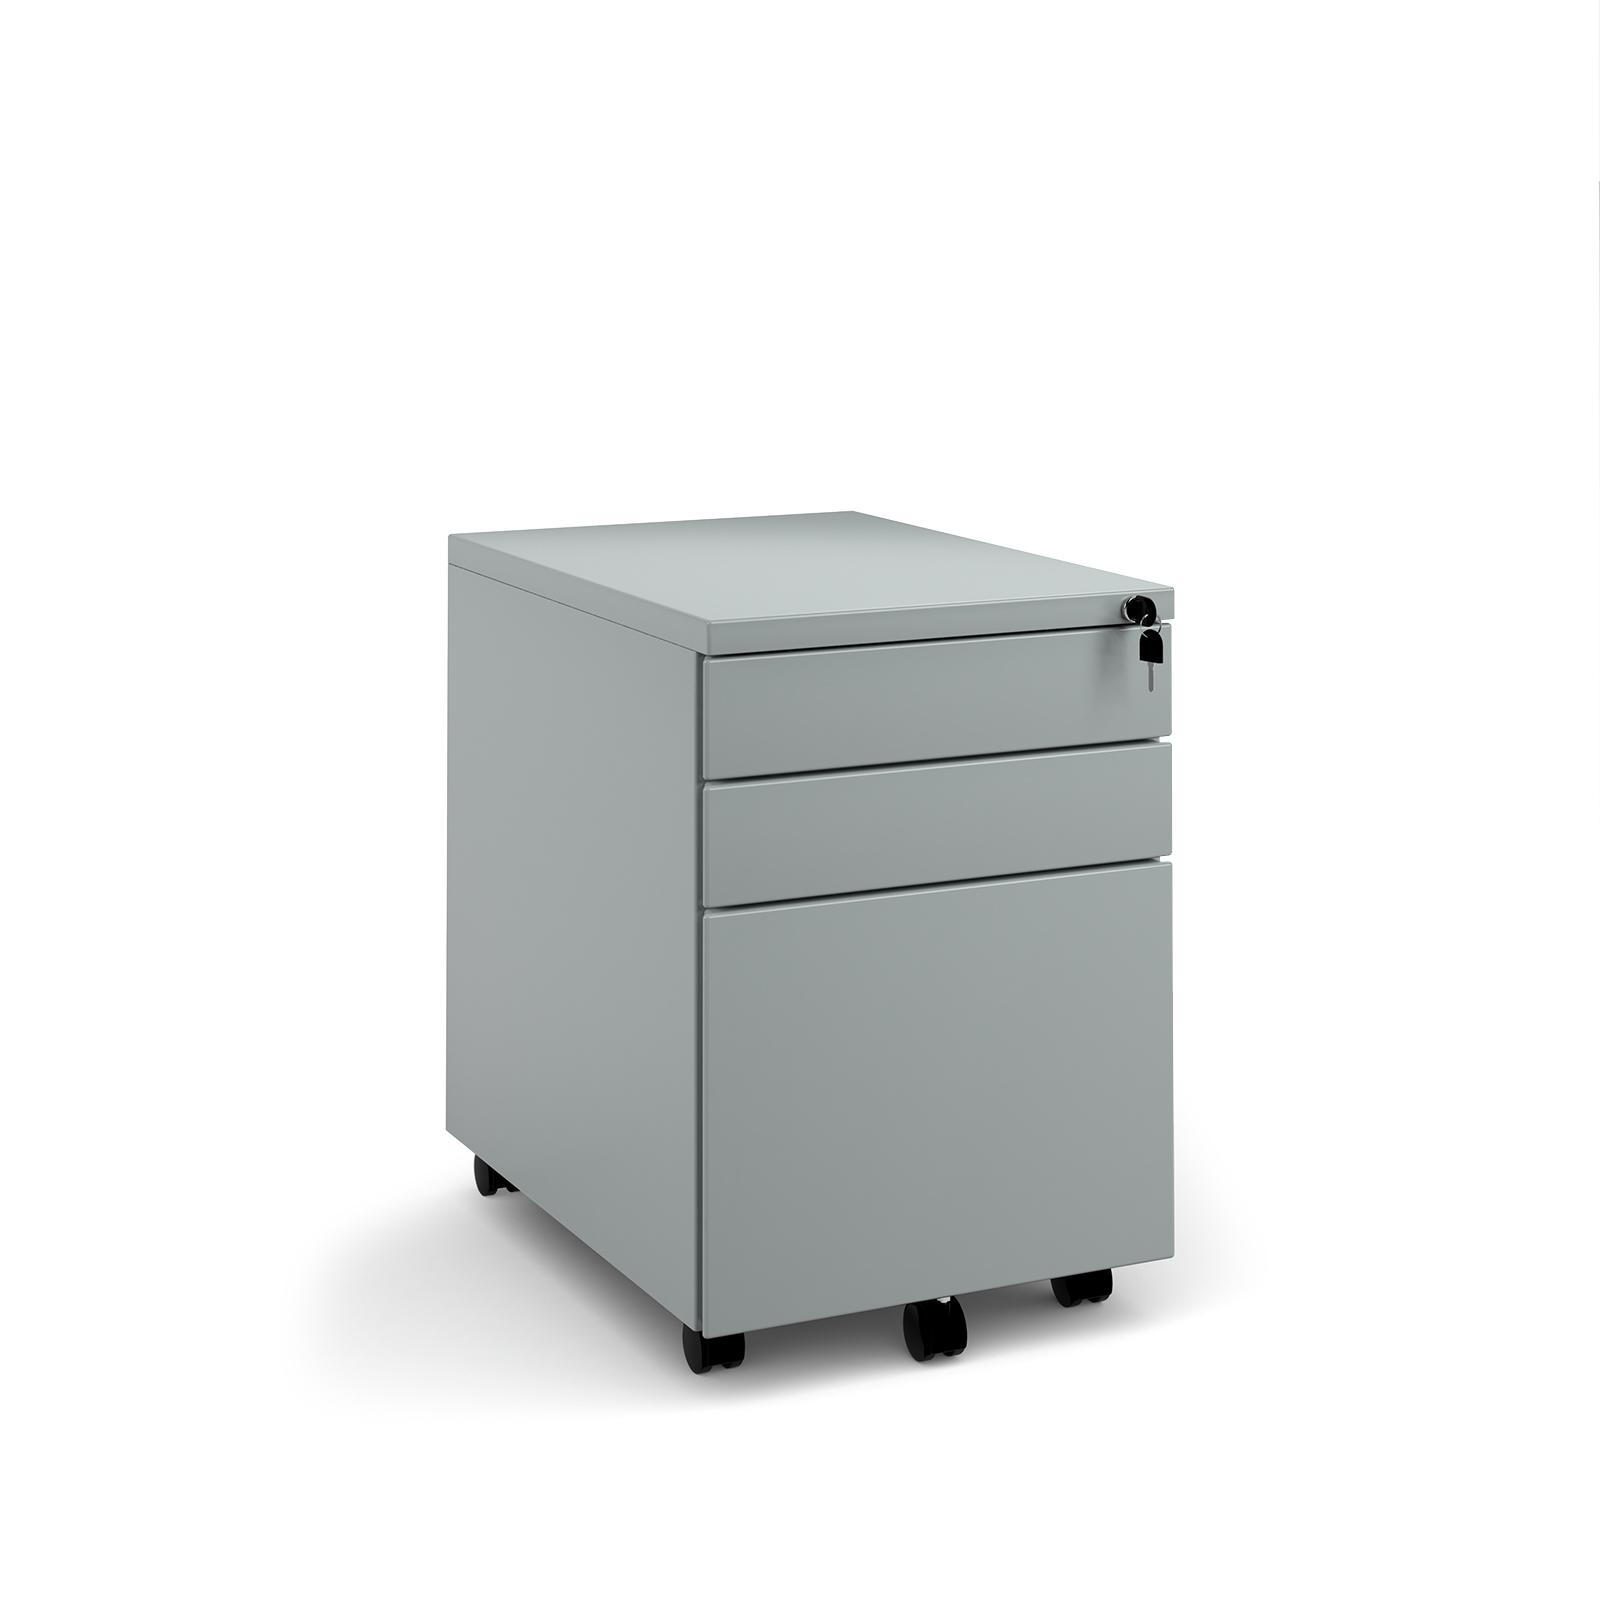 Steel 3 drawer mobile pedestal - silver